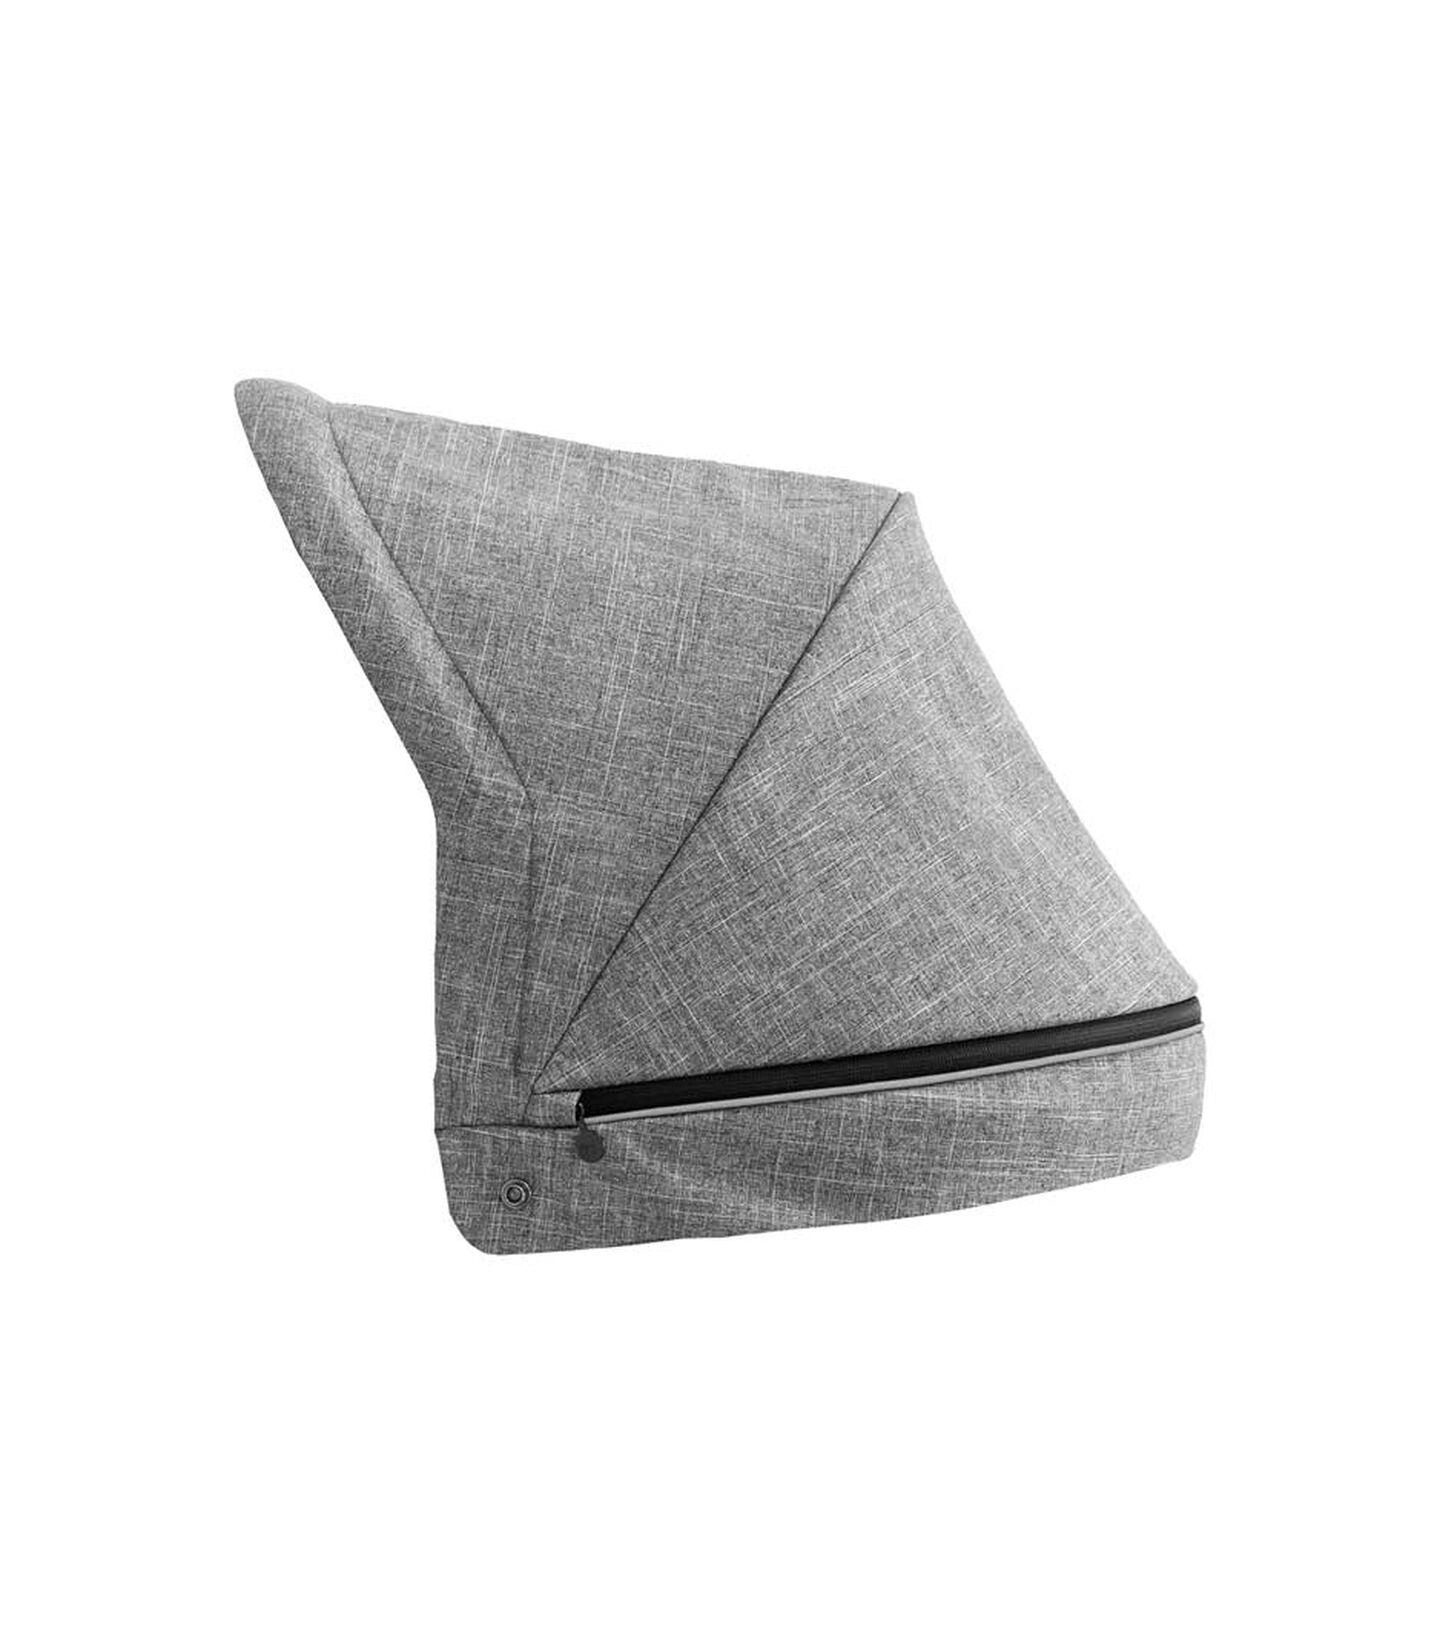 Stokke® Beat™ spare part. Canopy, Black Melange. view 2